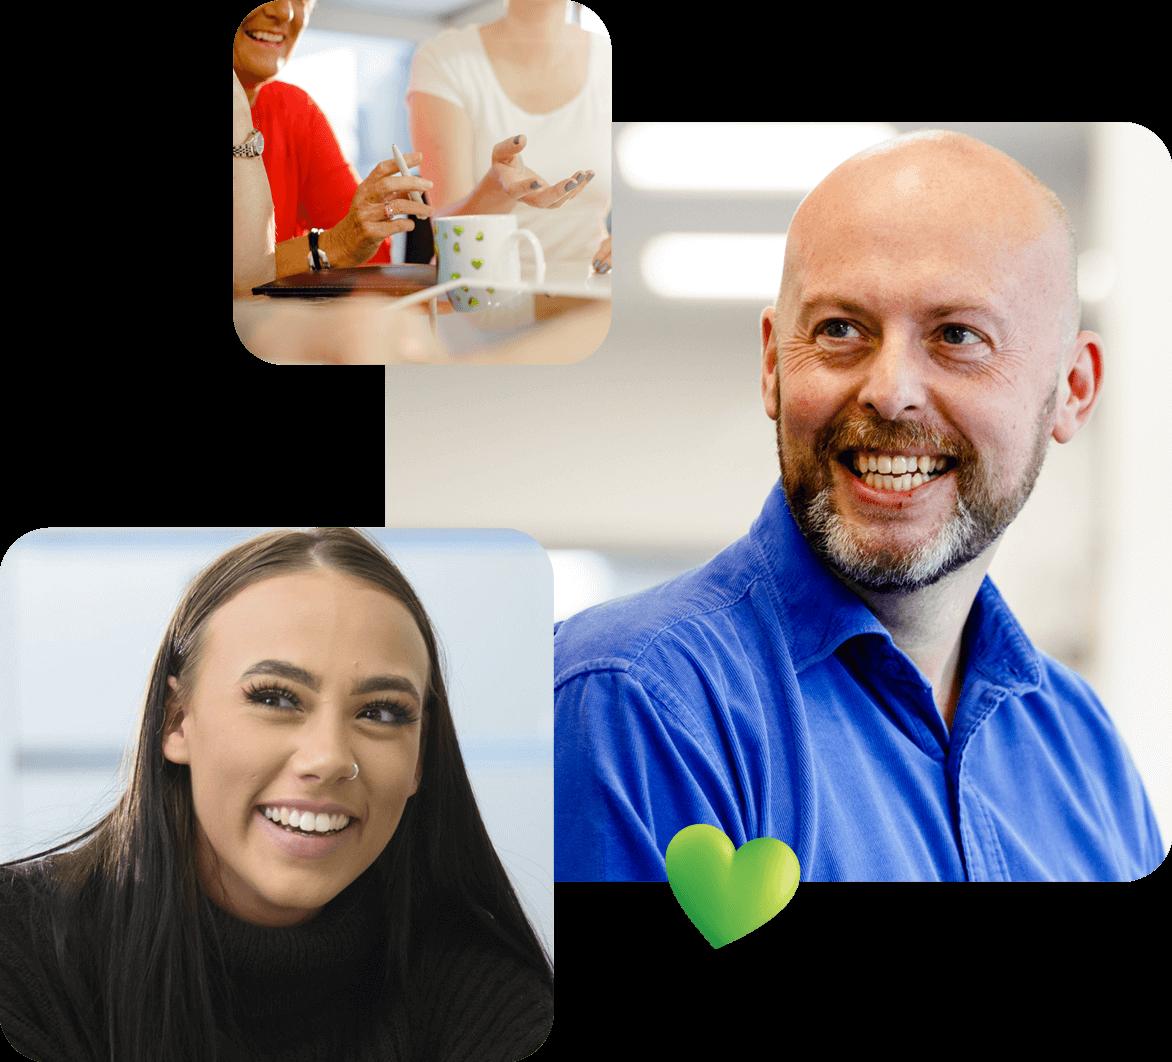 LV Jobs - Careers Website - Employee Montage - Treble Image 4.png